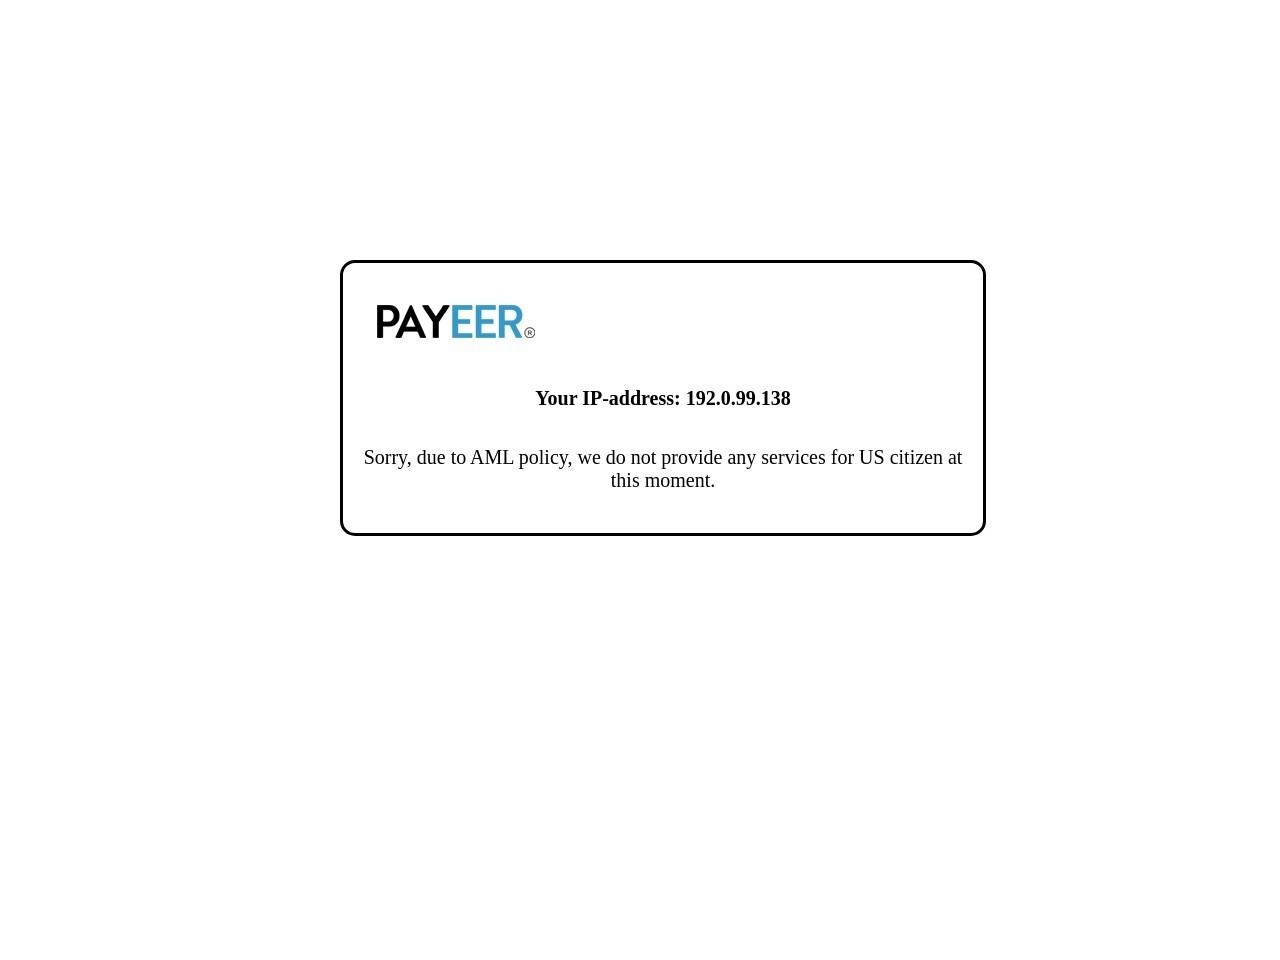 PAYEER